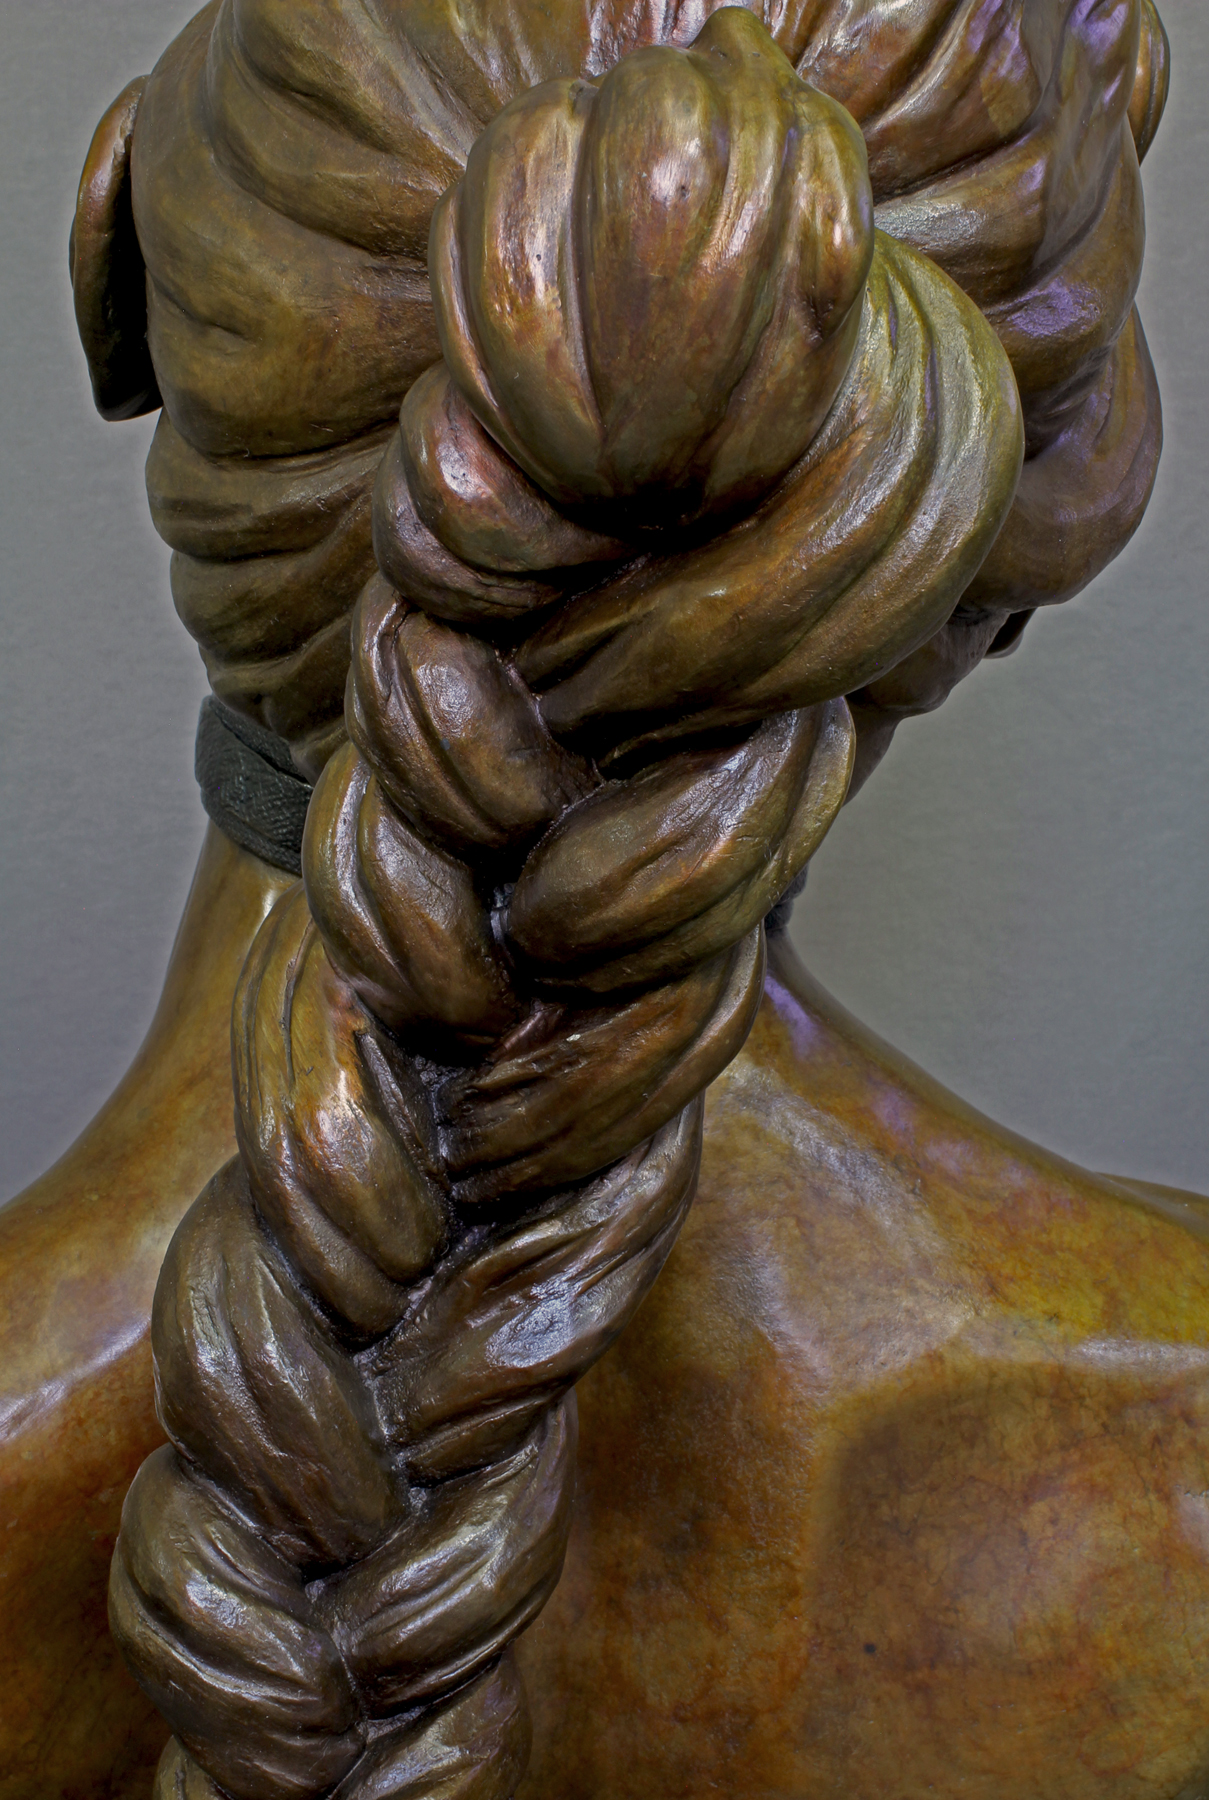 Braid close up